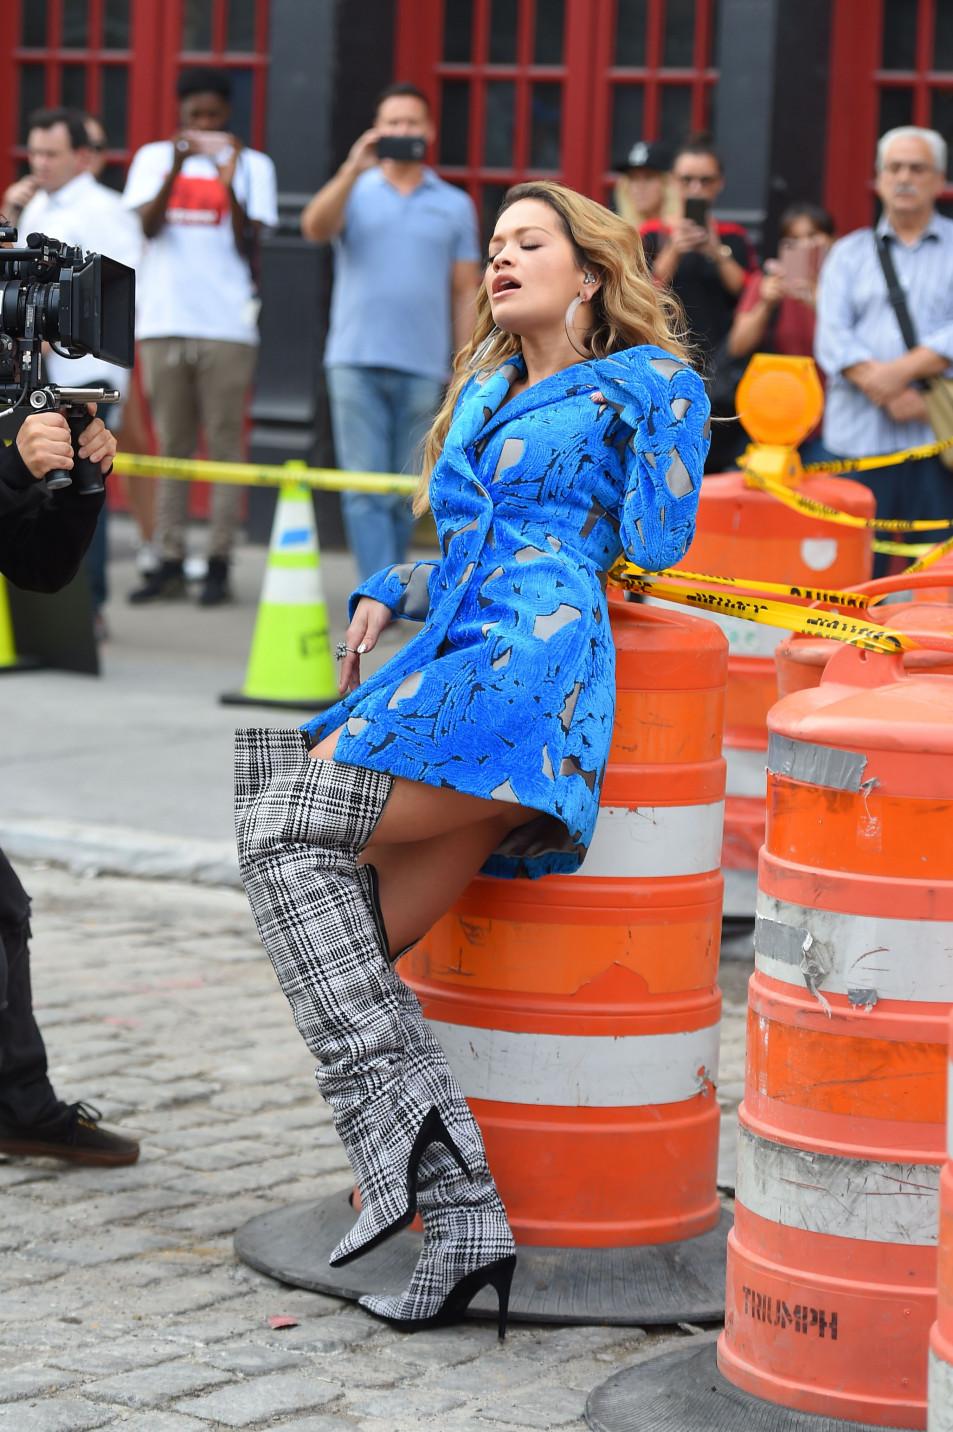 Rita-Ora---upskirt-during-her-video-shoot-in-NYC---10052017-5.jpg